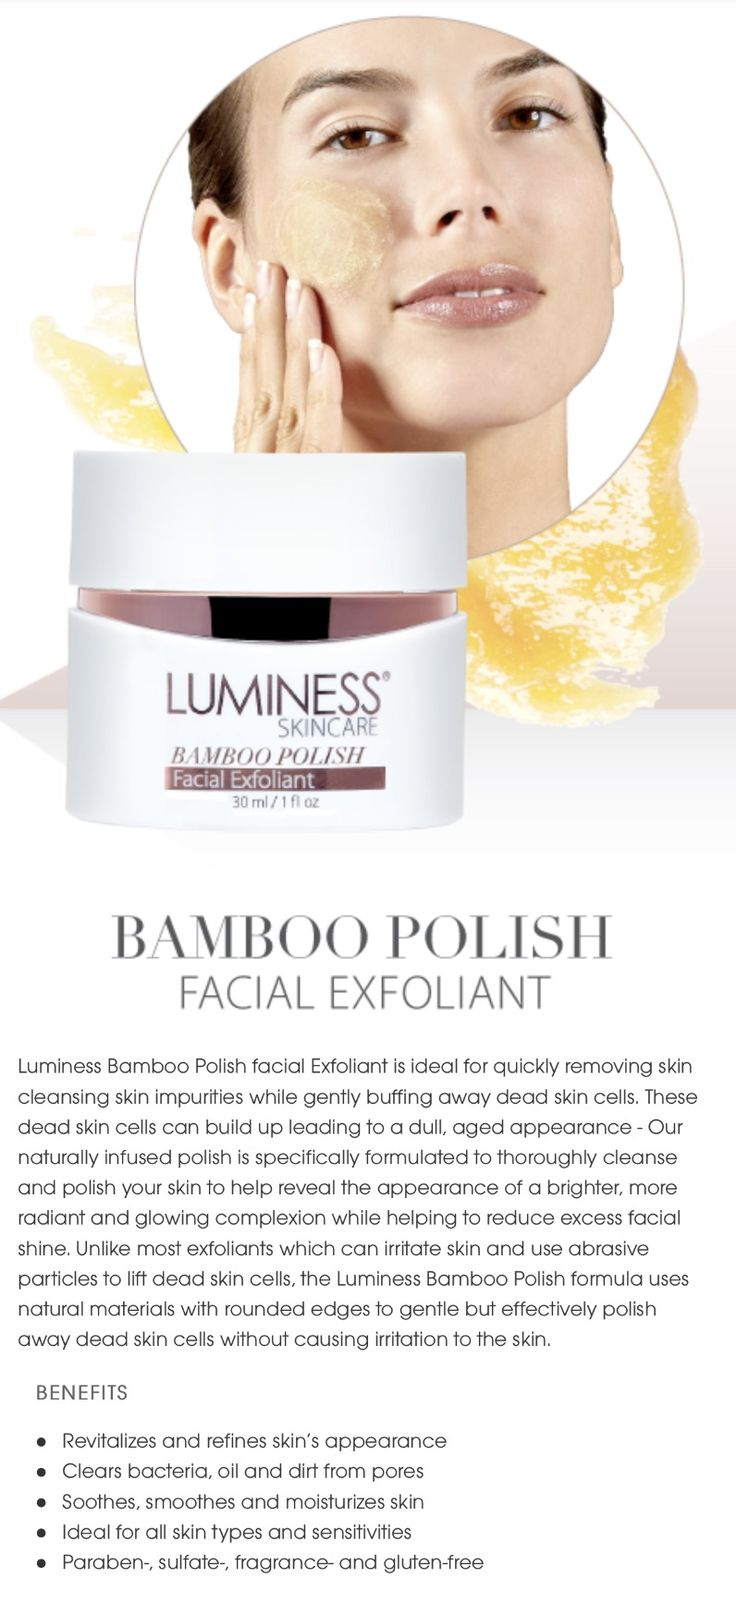 Bamboo Polish Facial Exfoliant LuminessAiress SkinCare